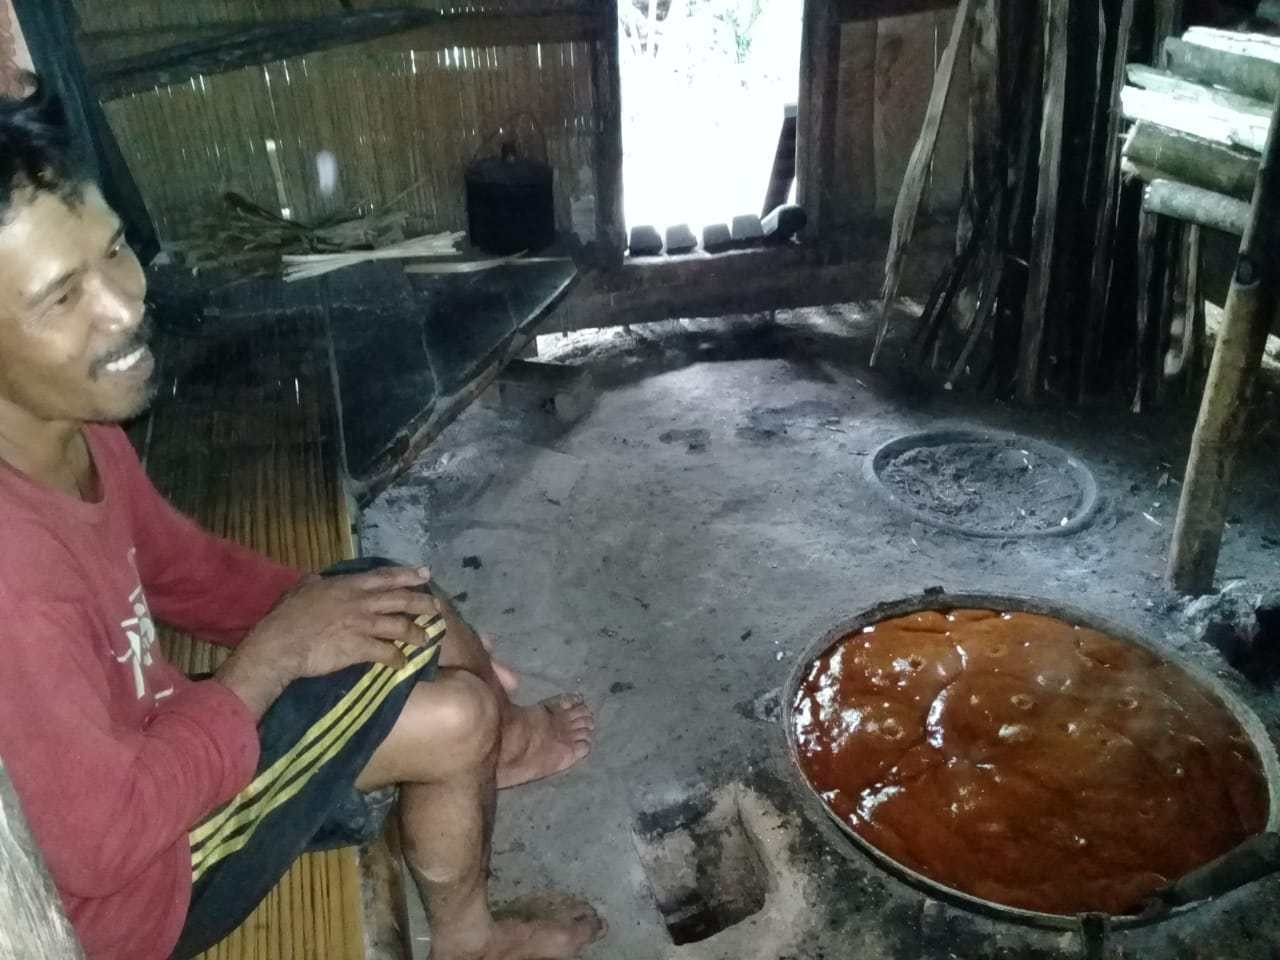 Proses pembuatan gula | sumber: pelitabanten.com